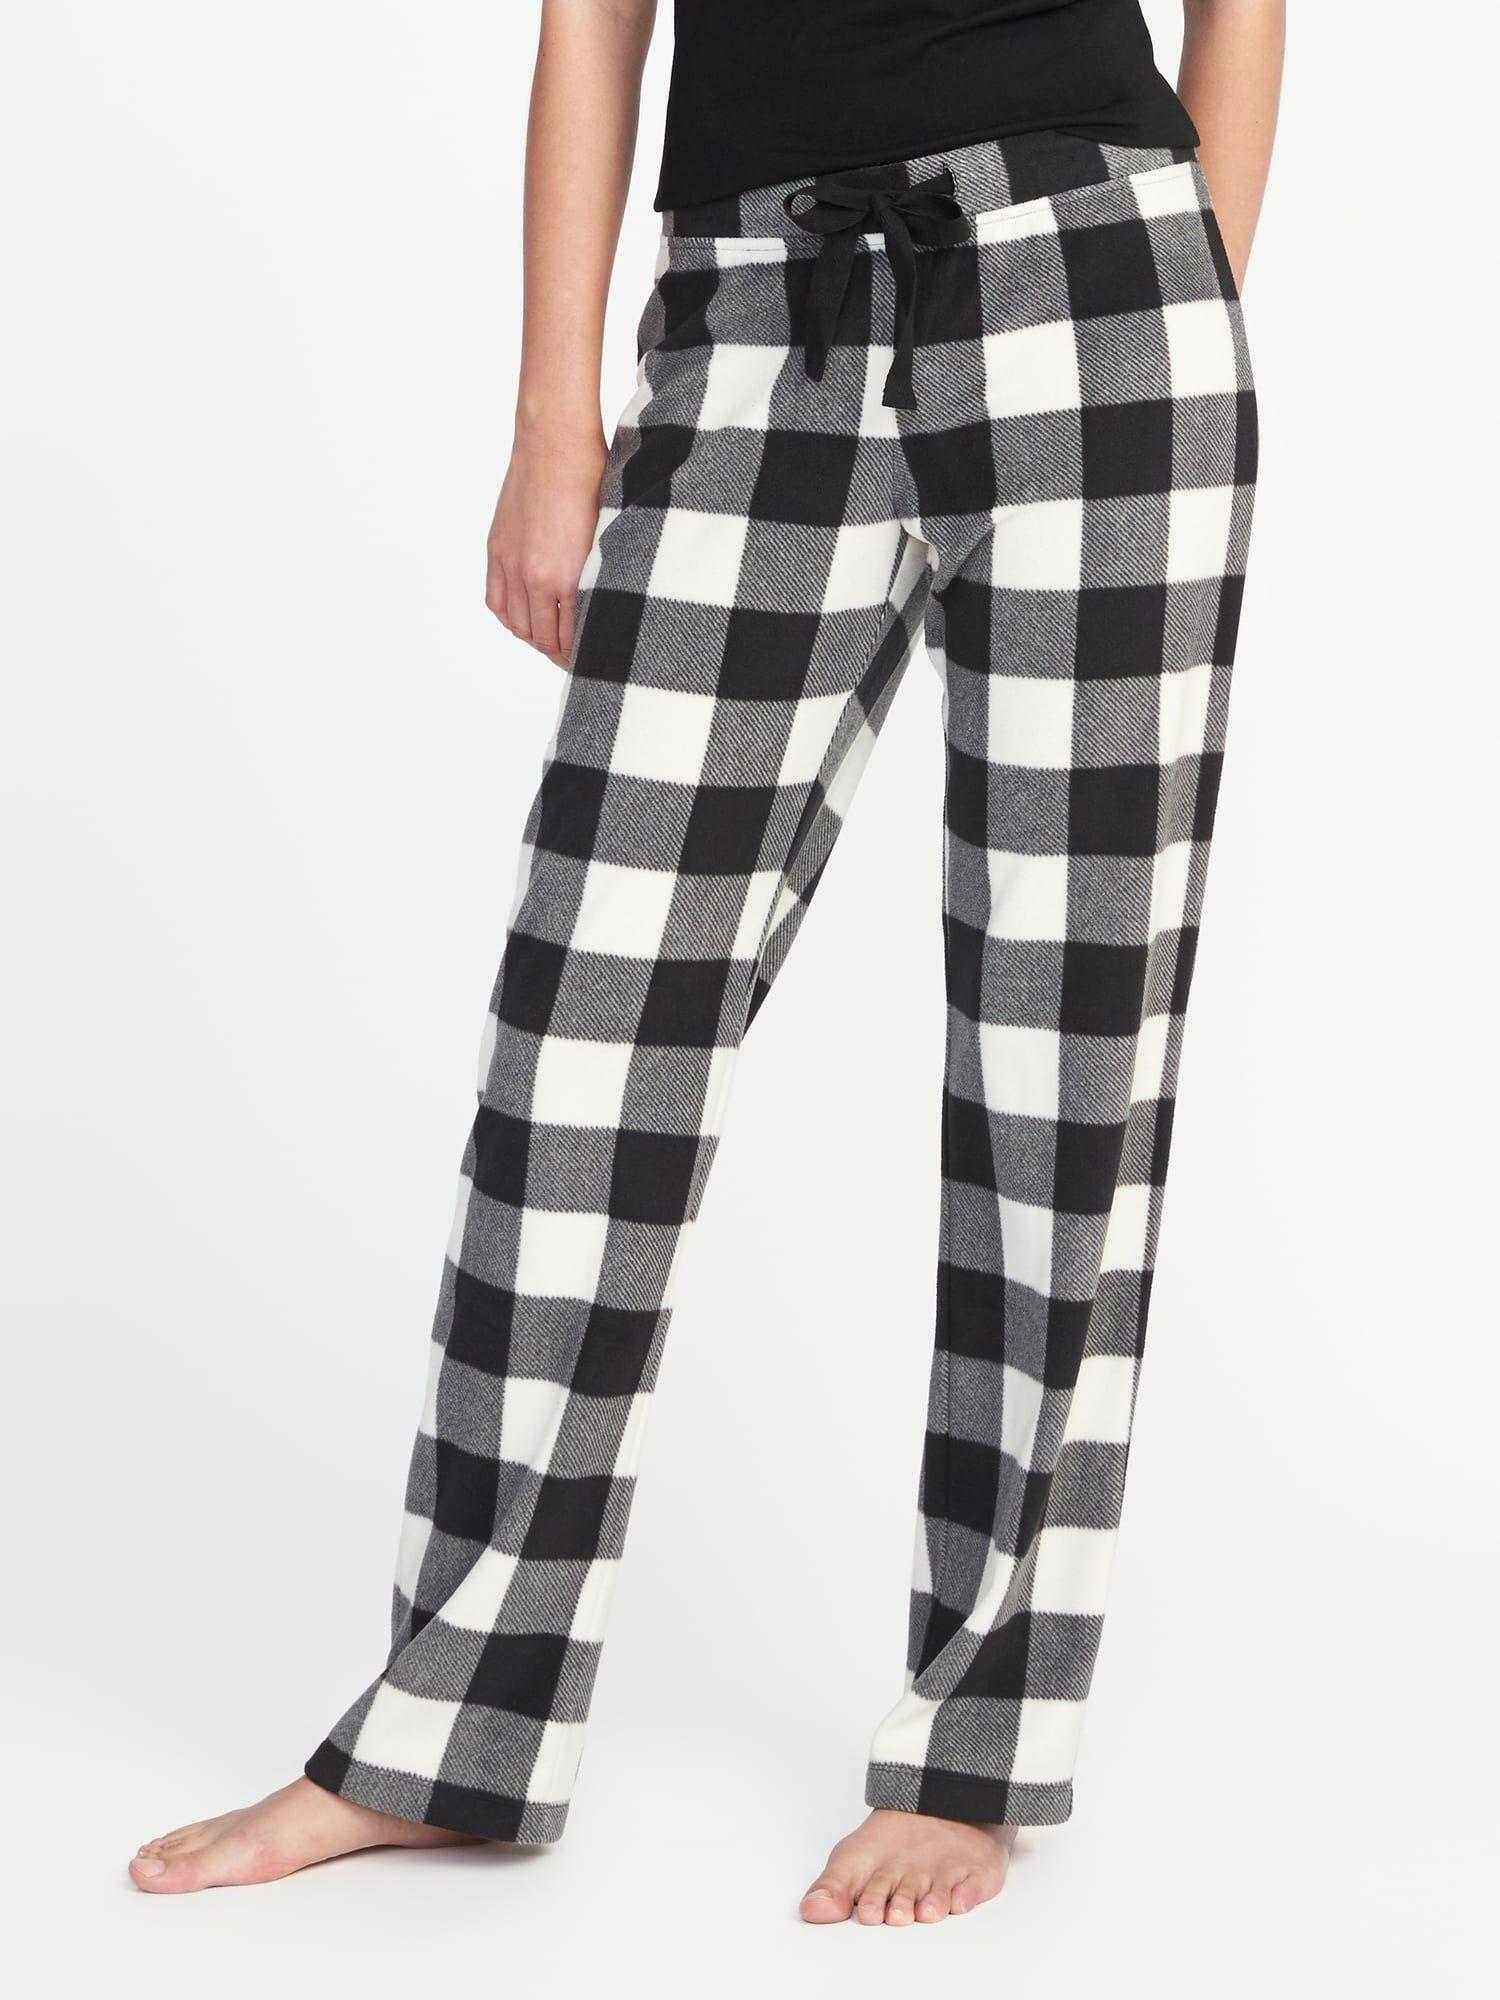 product photo Pants for women, Old navy pajamas, Fleece